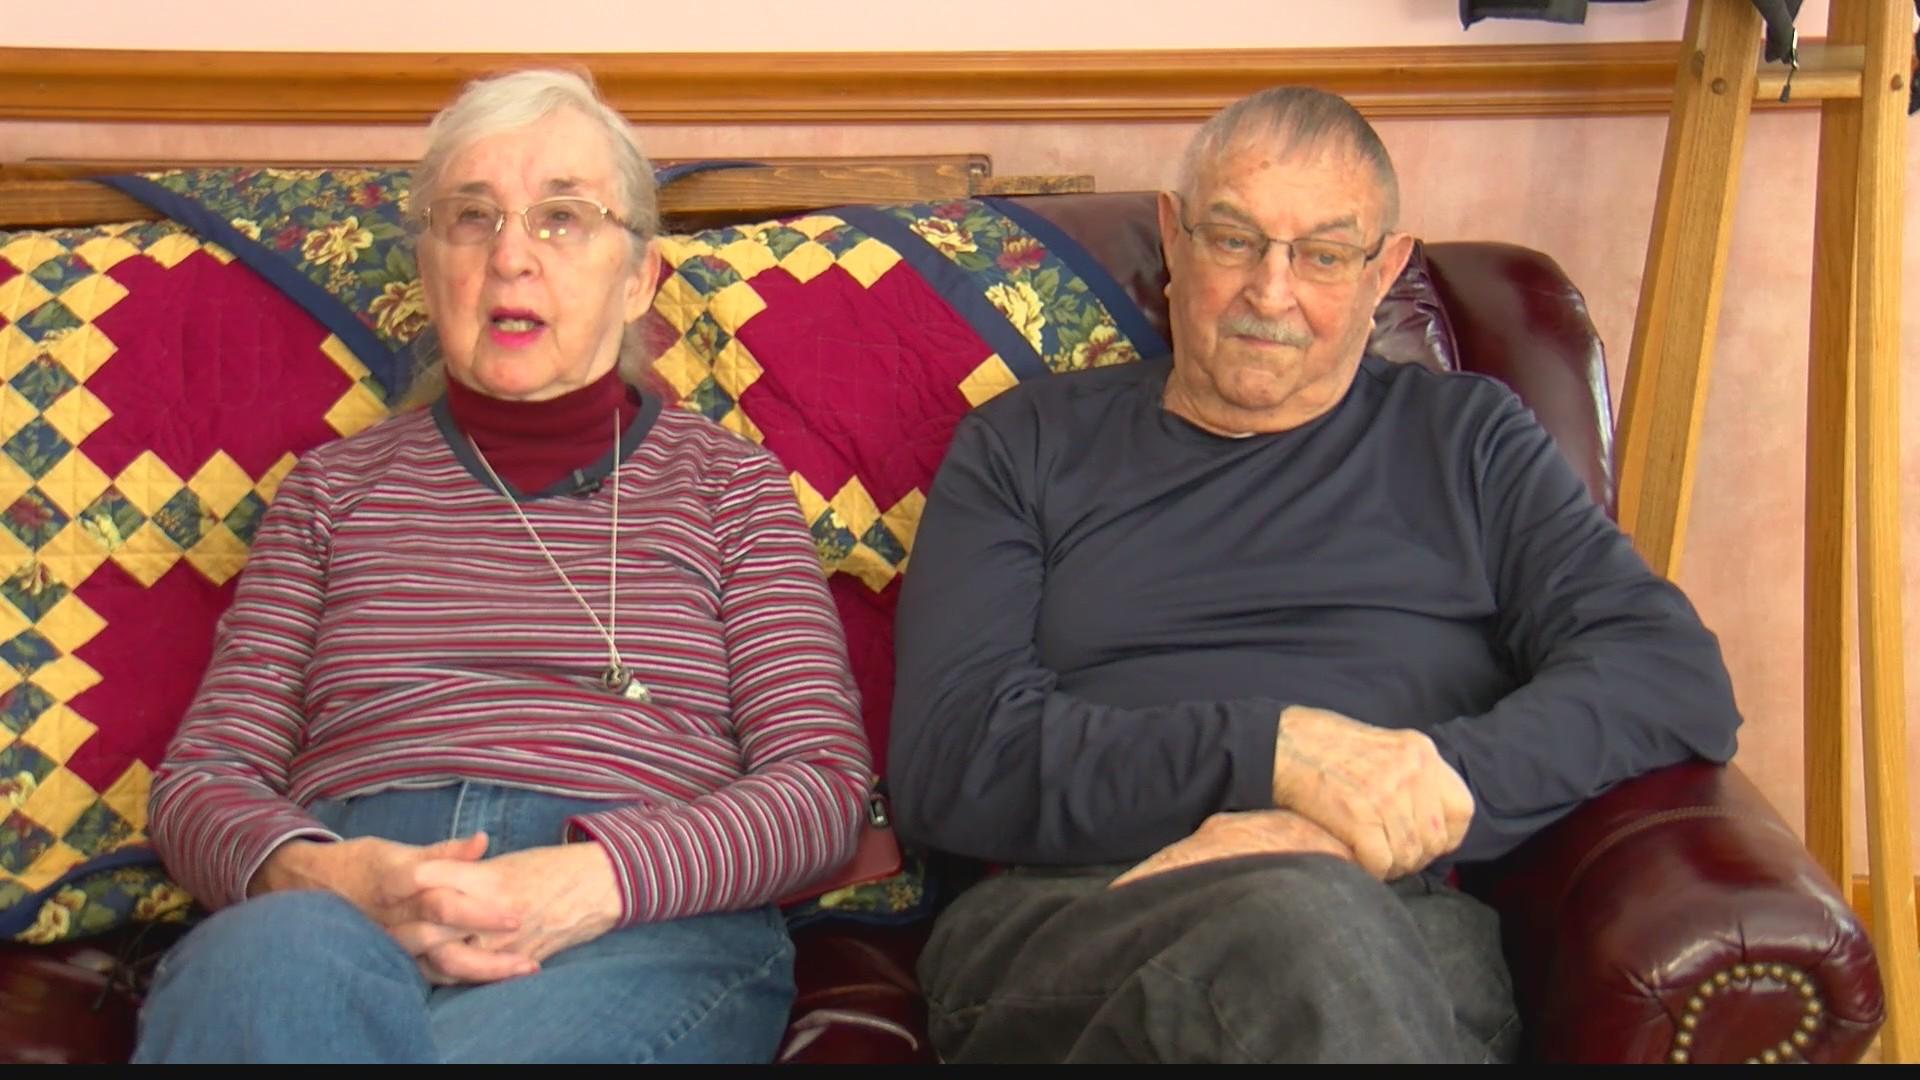 Neighbors_help_Williamsburg_couple_shove_0_20190221234202